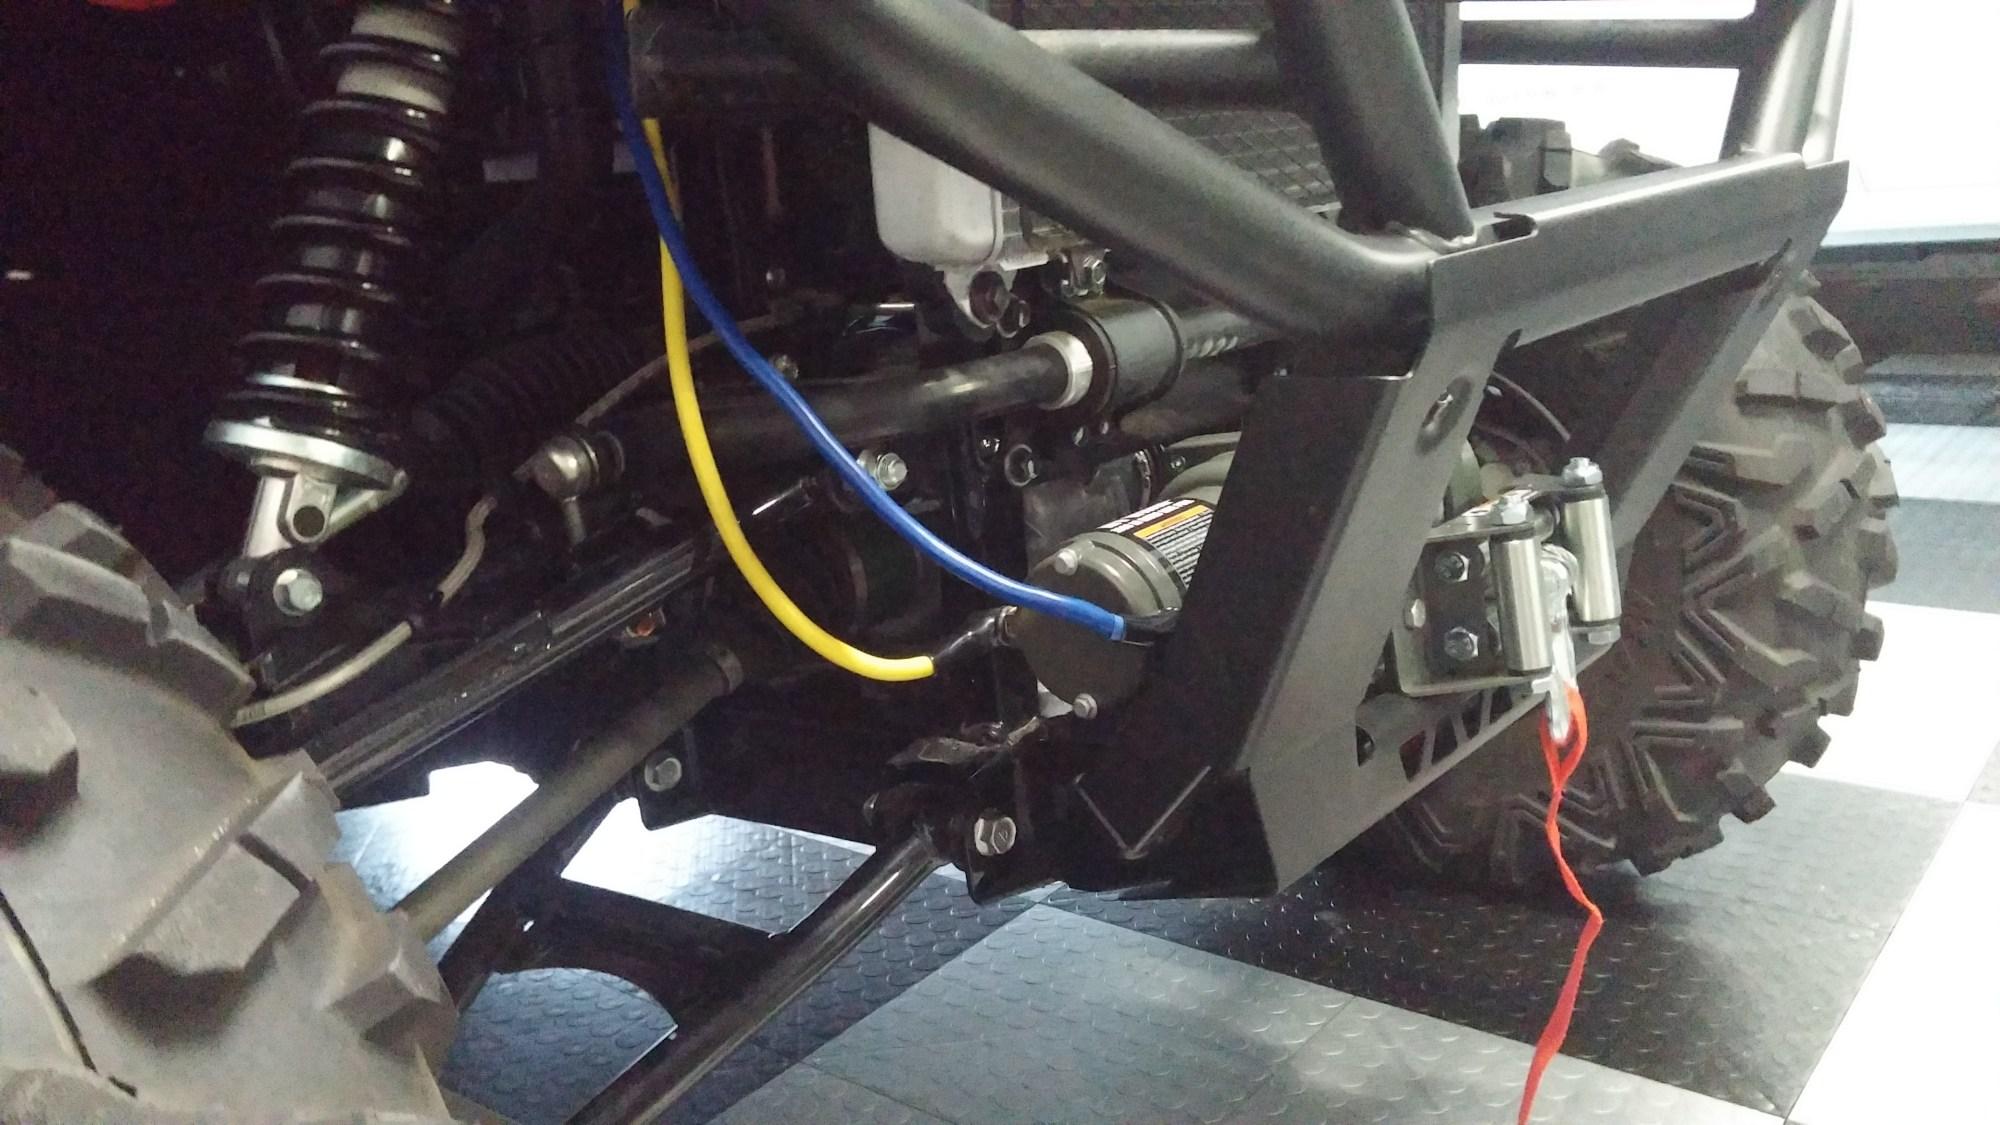 hight resolution of badlands 3500 winch install kawasaki teryx forum mix kawasaki teryx winch wiring 1